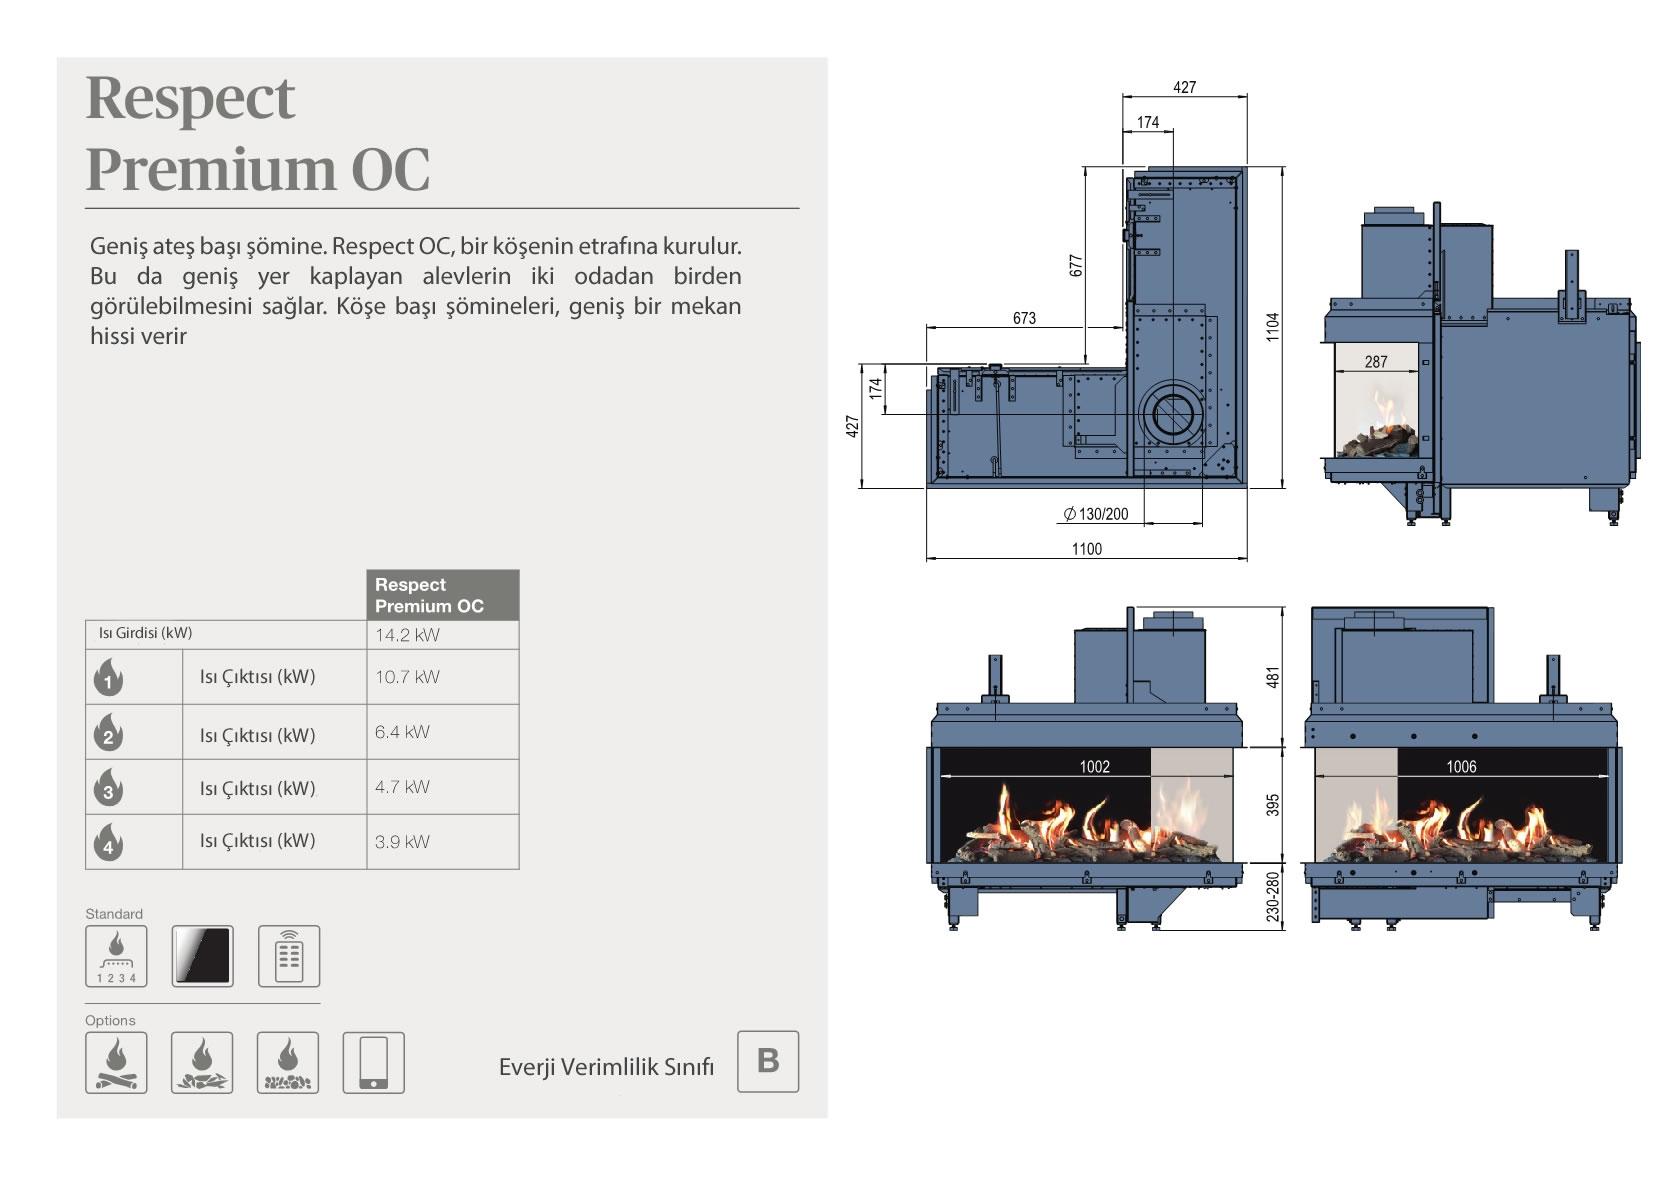 Faber Natural Gas Fireplaces - Respect Premium OC